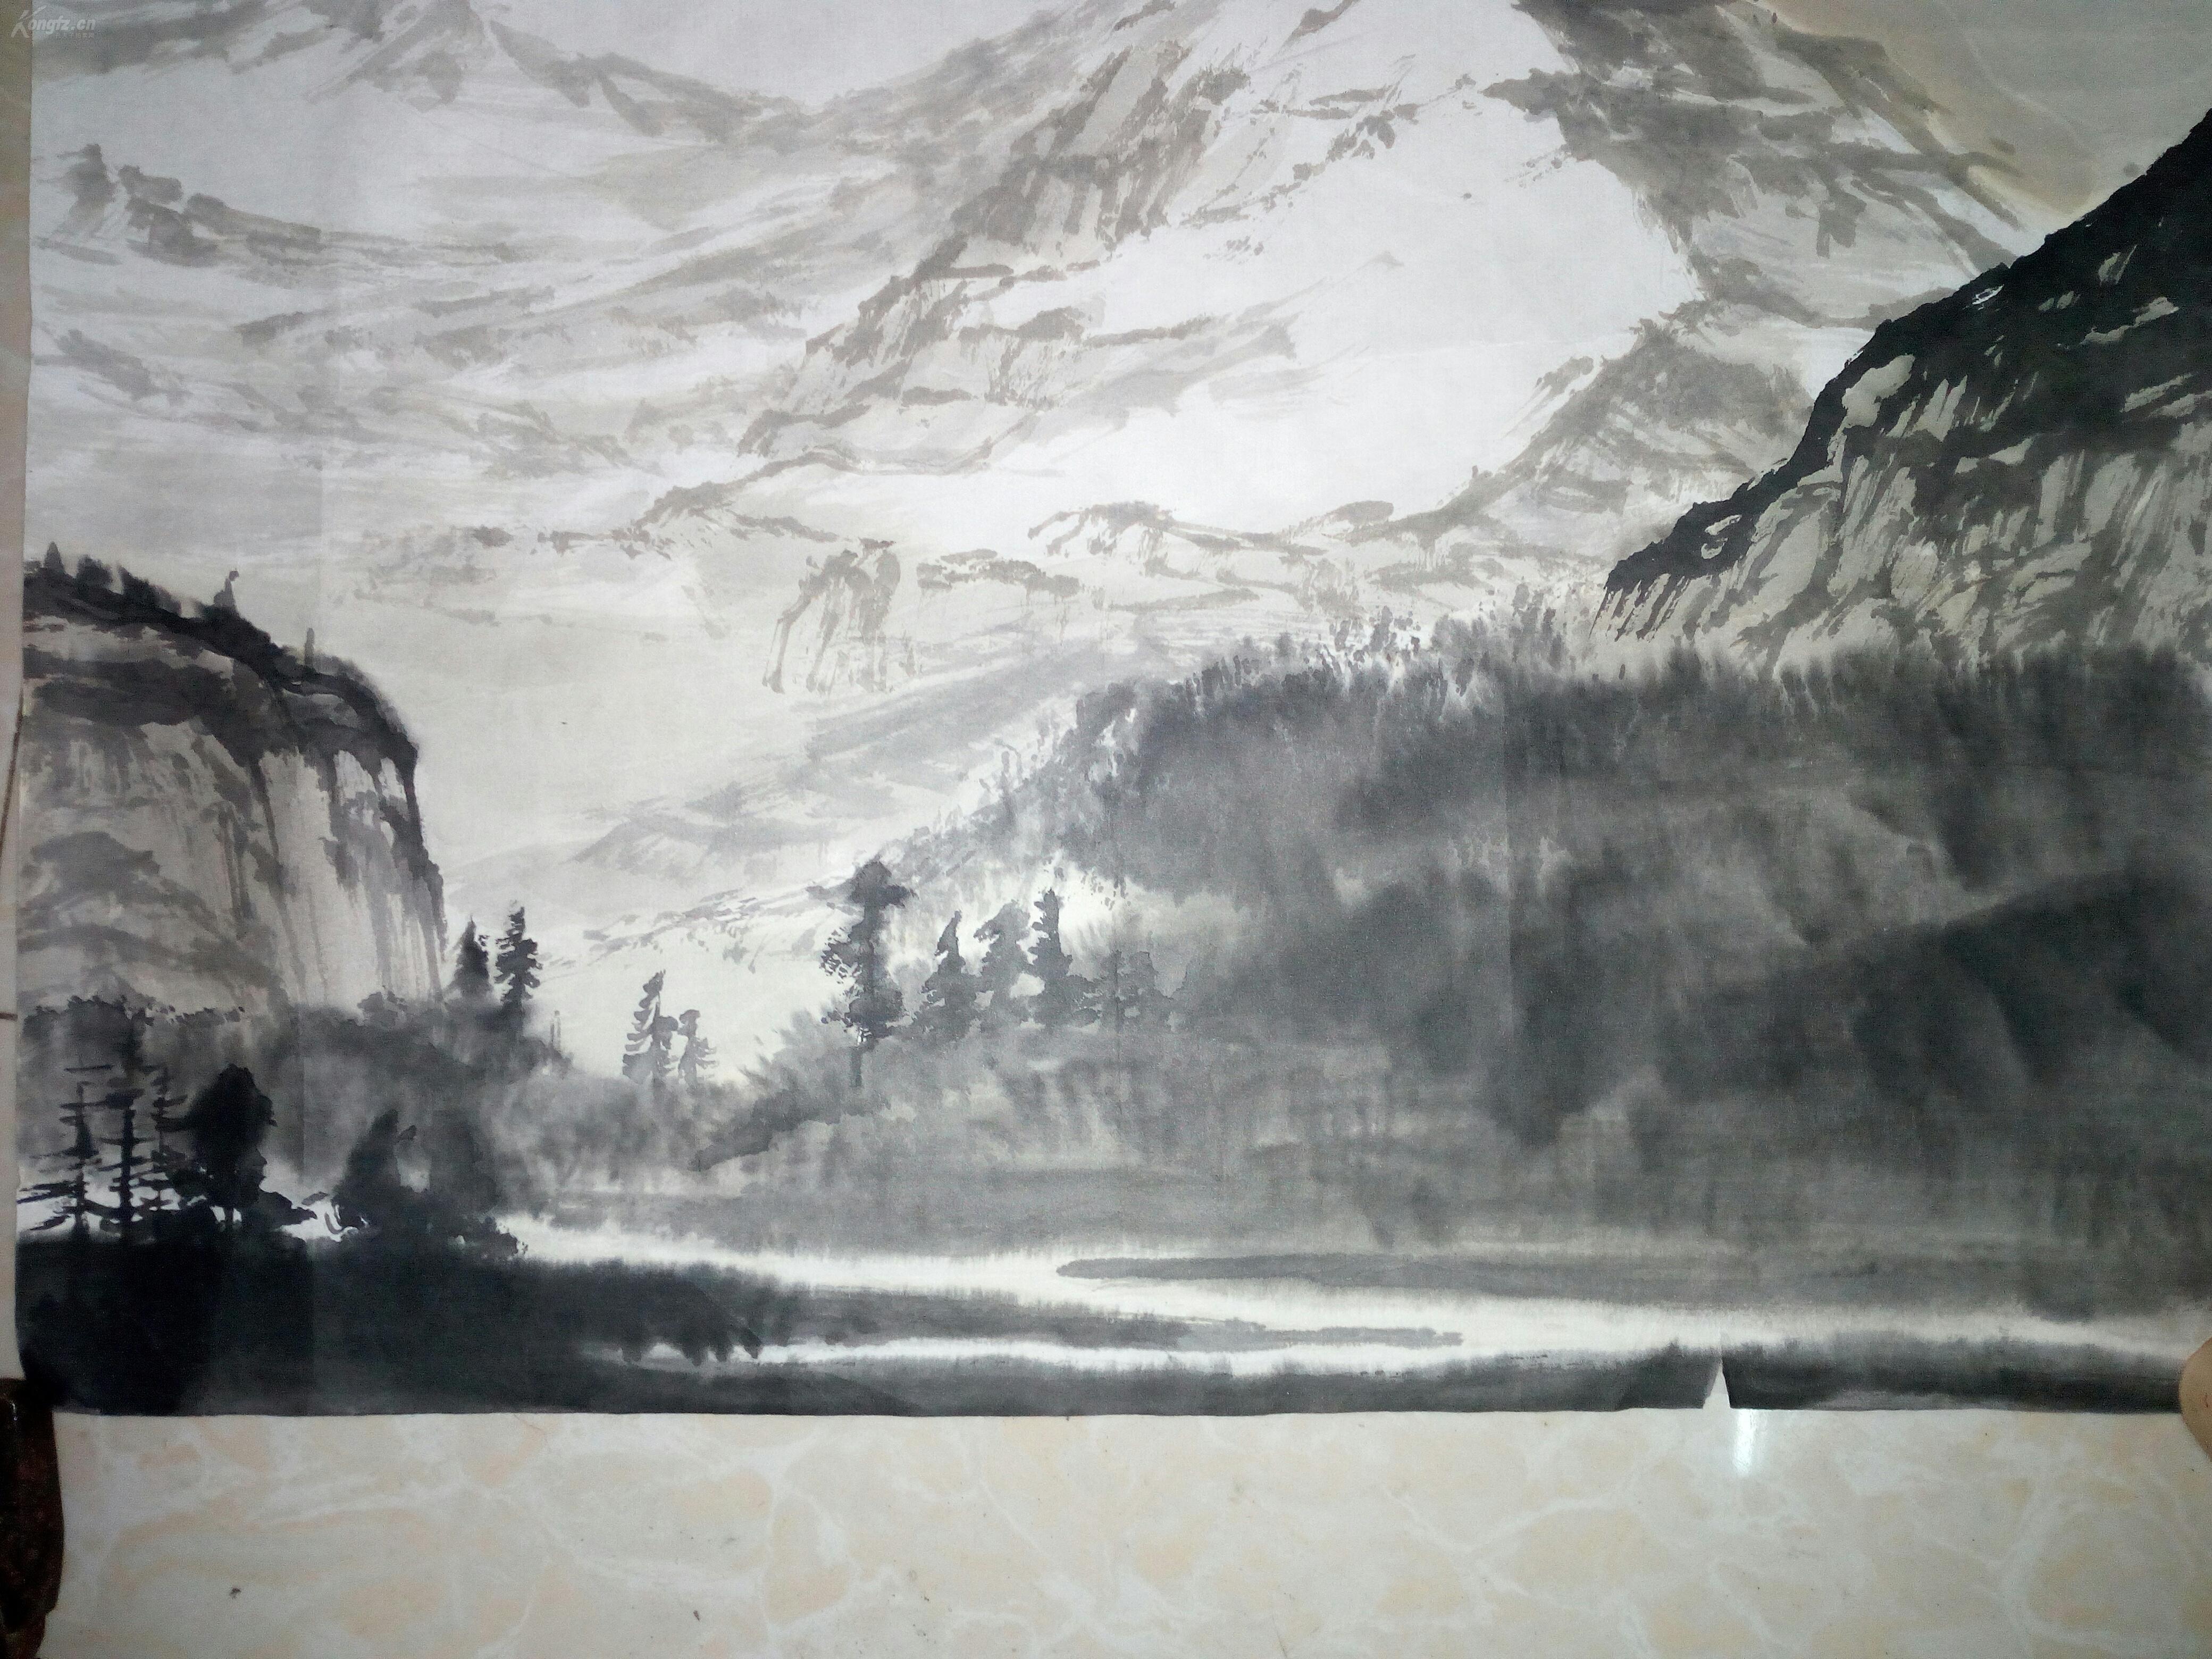 风景古画ps素材